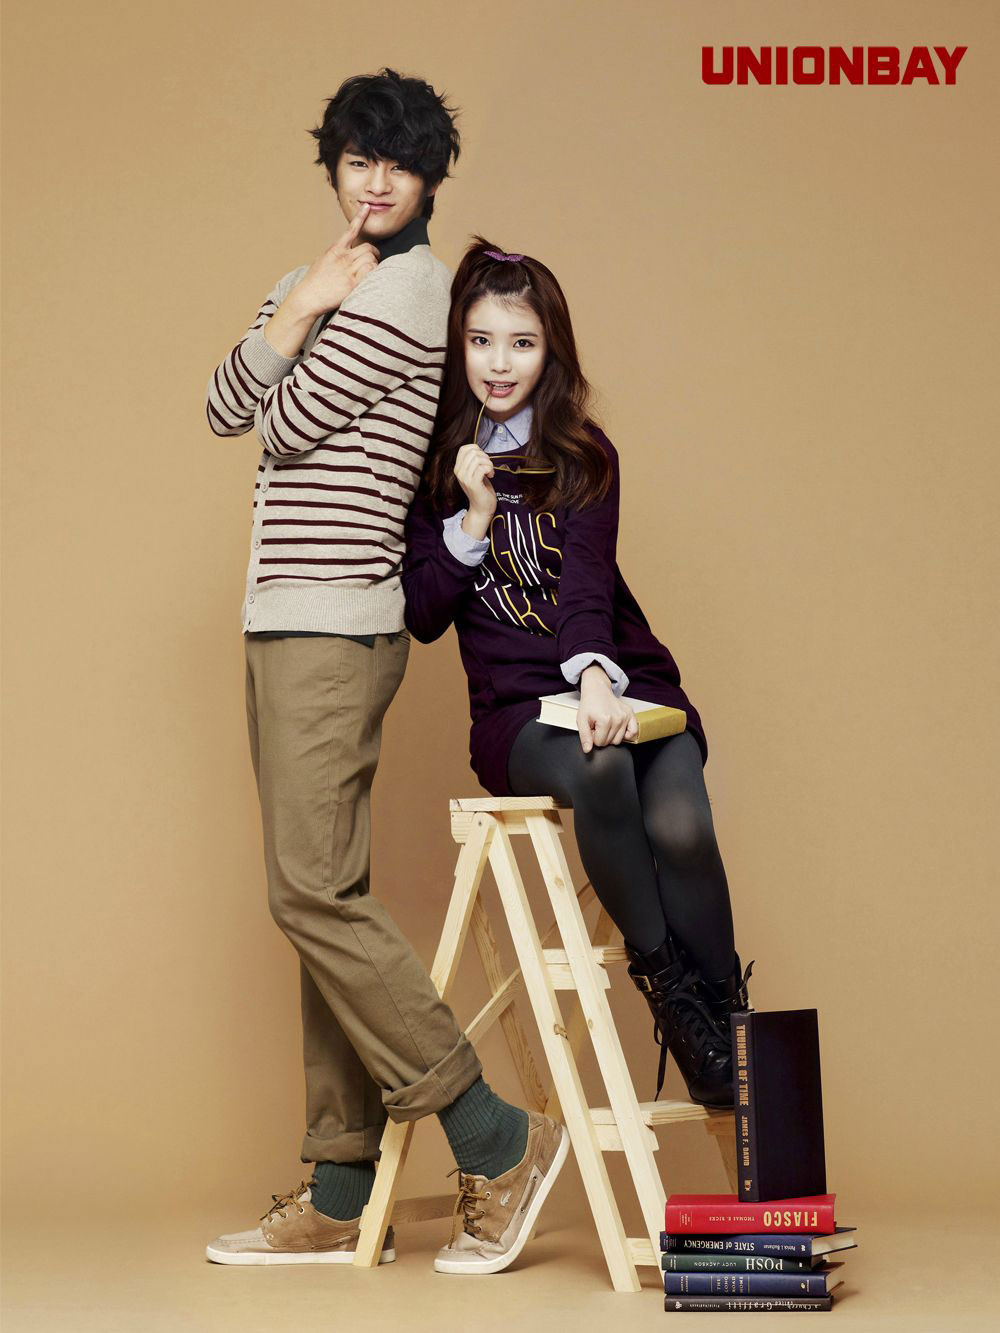 IU Seo Inguk Korean Unionbay clothing